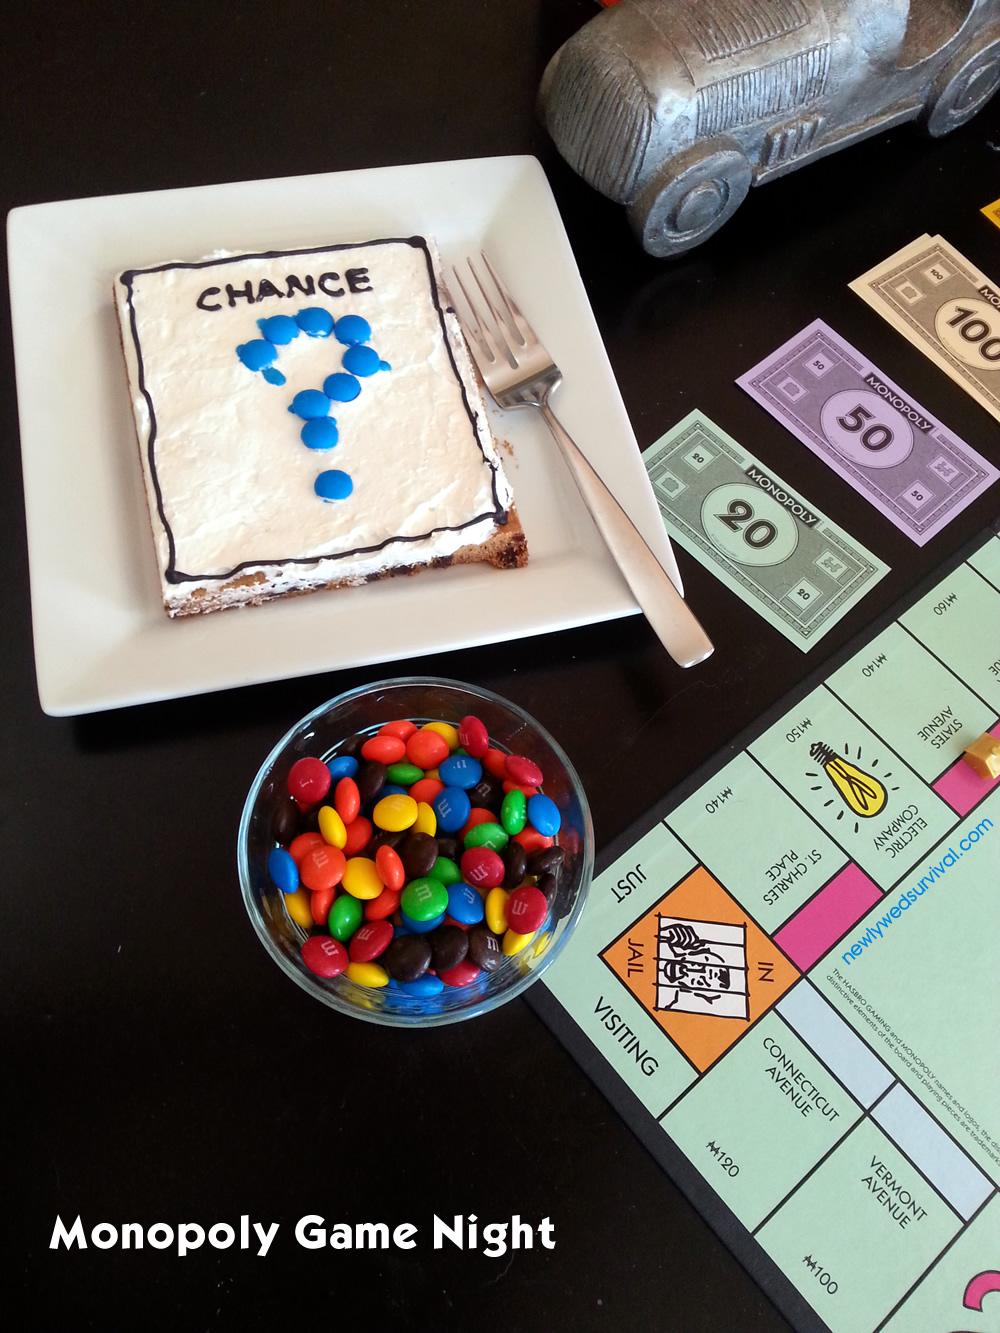 Monopoly game night cookies #GameNightIn #ad #cbias